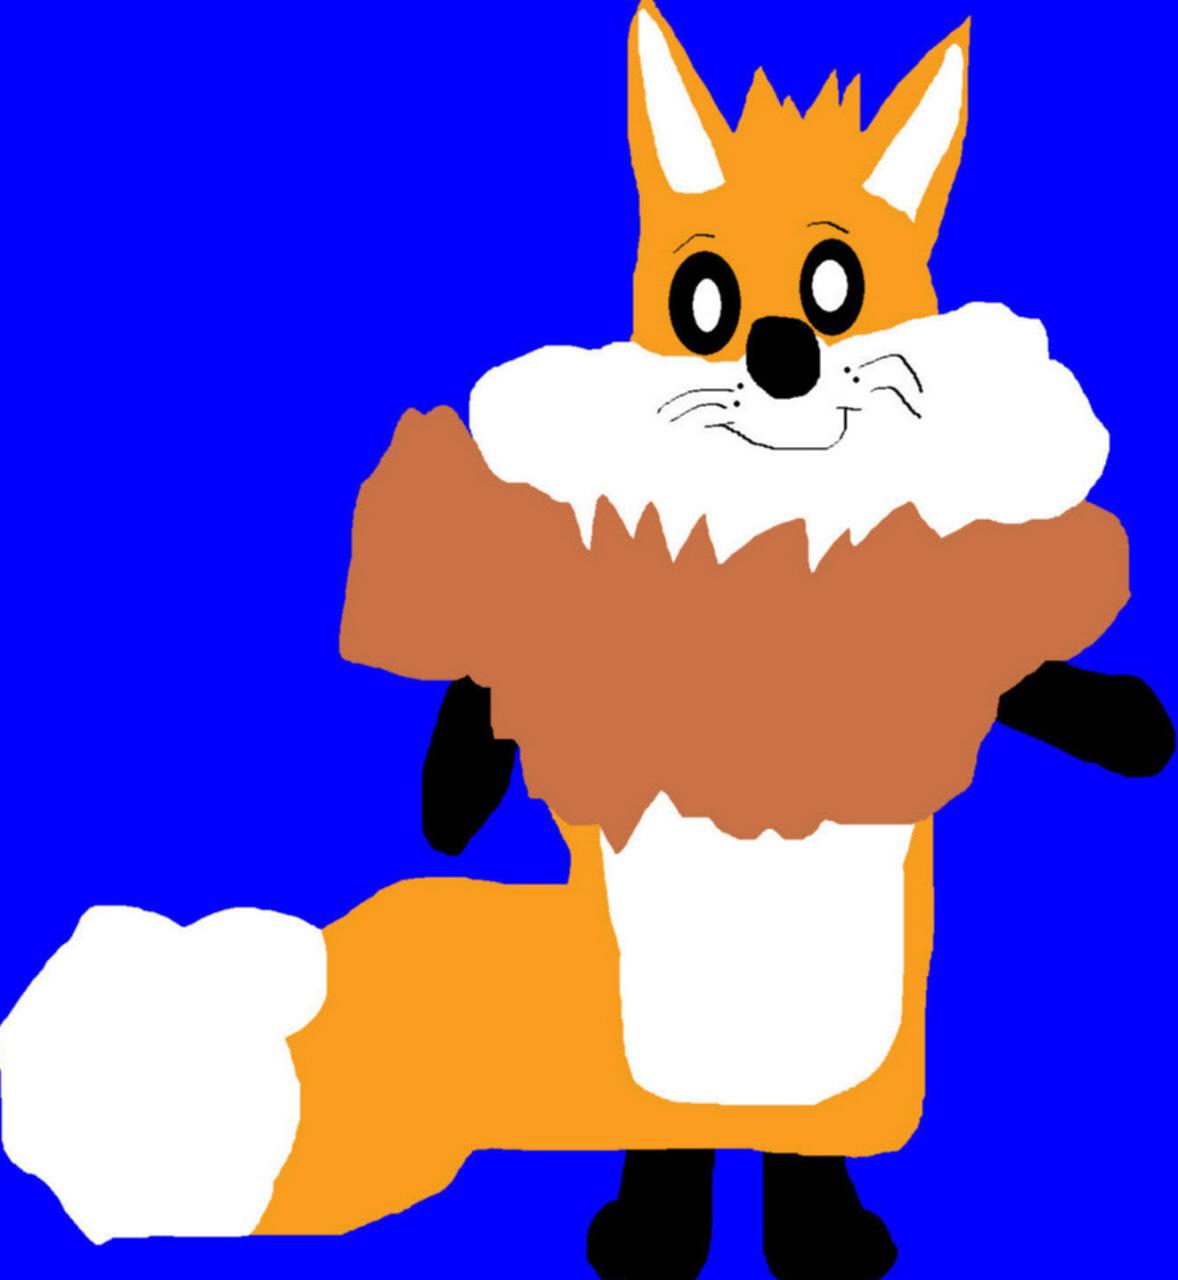 Circo Fox Plush Less Fluffier Orange Version MS Paint^^ by Falconlobo